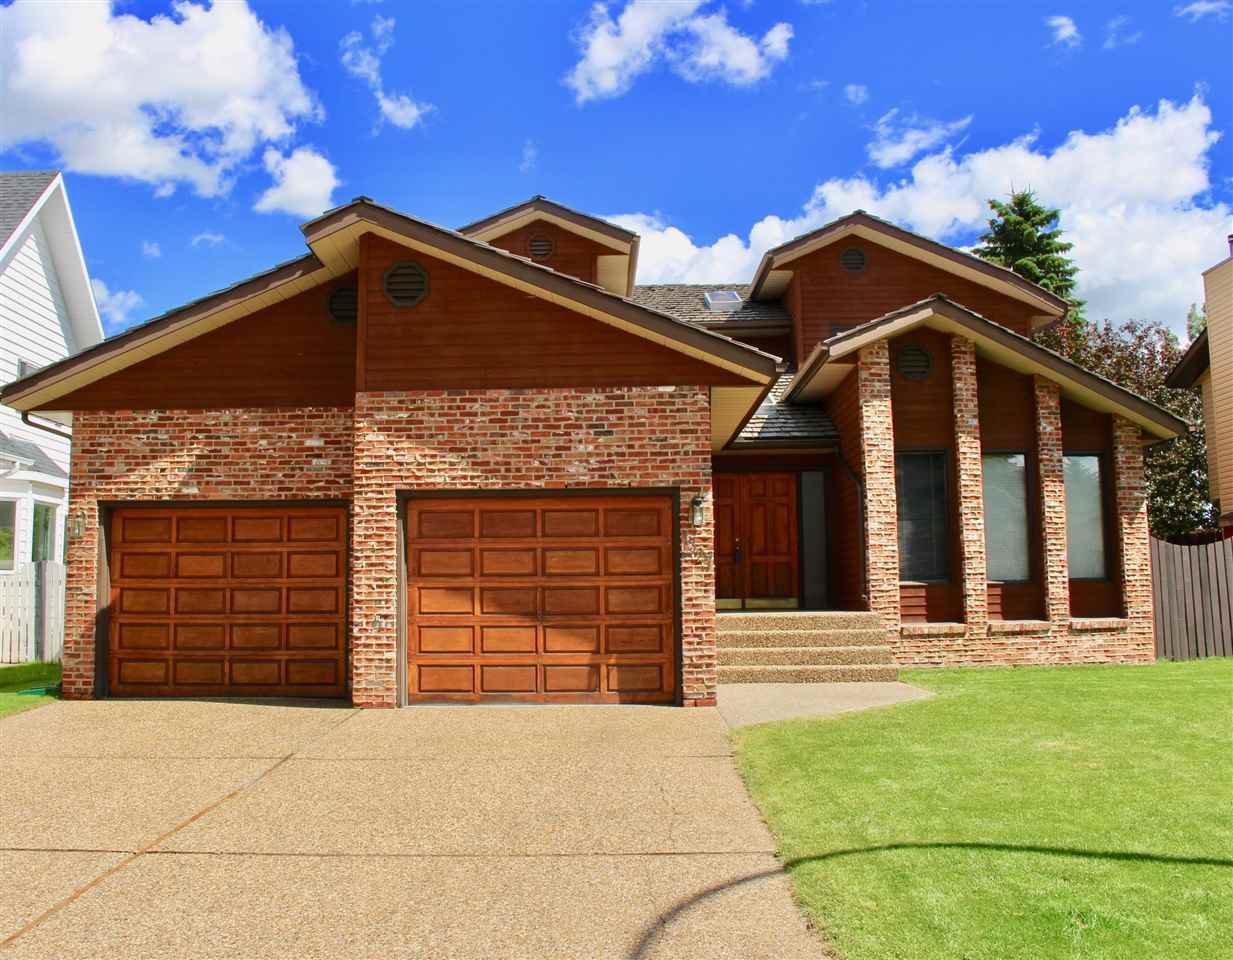 Main Photo: 4327 147 Street Street in Edmonton: Zone 14 House for sale : MLS®# E4206305